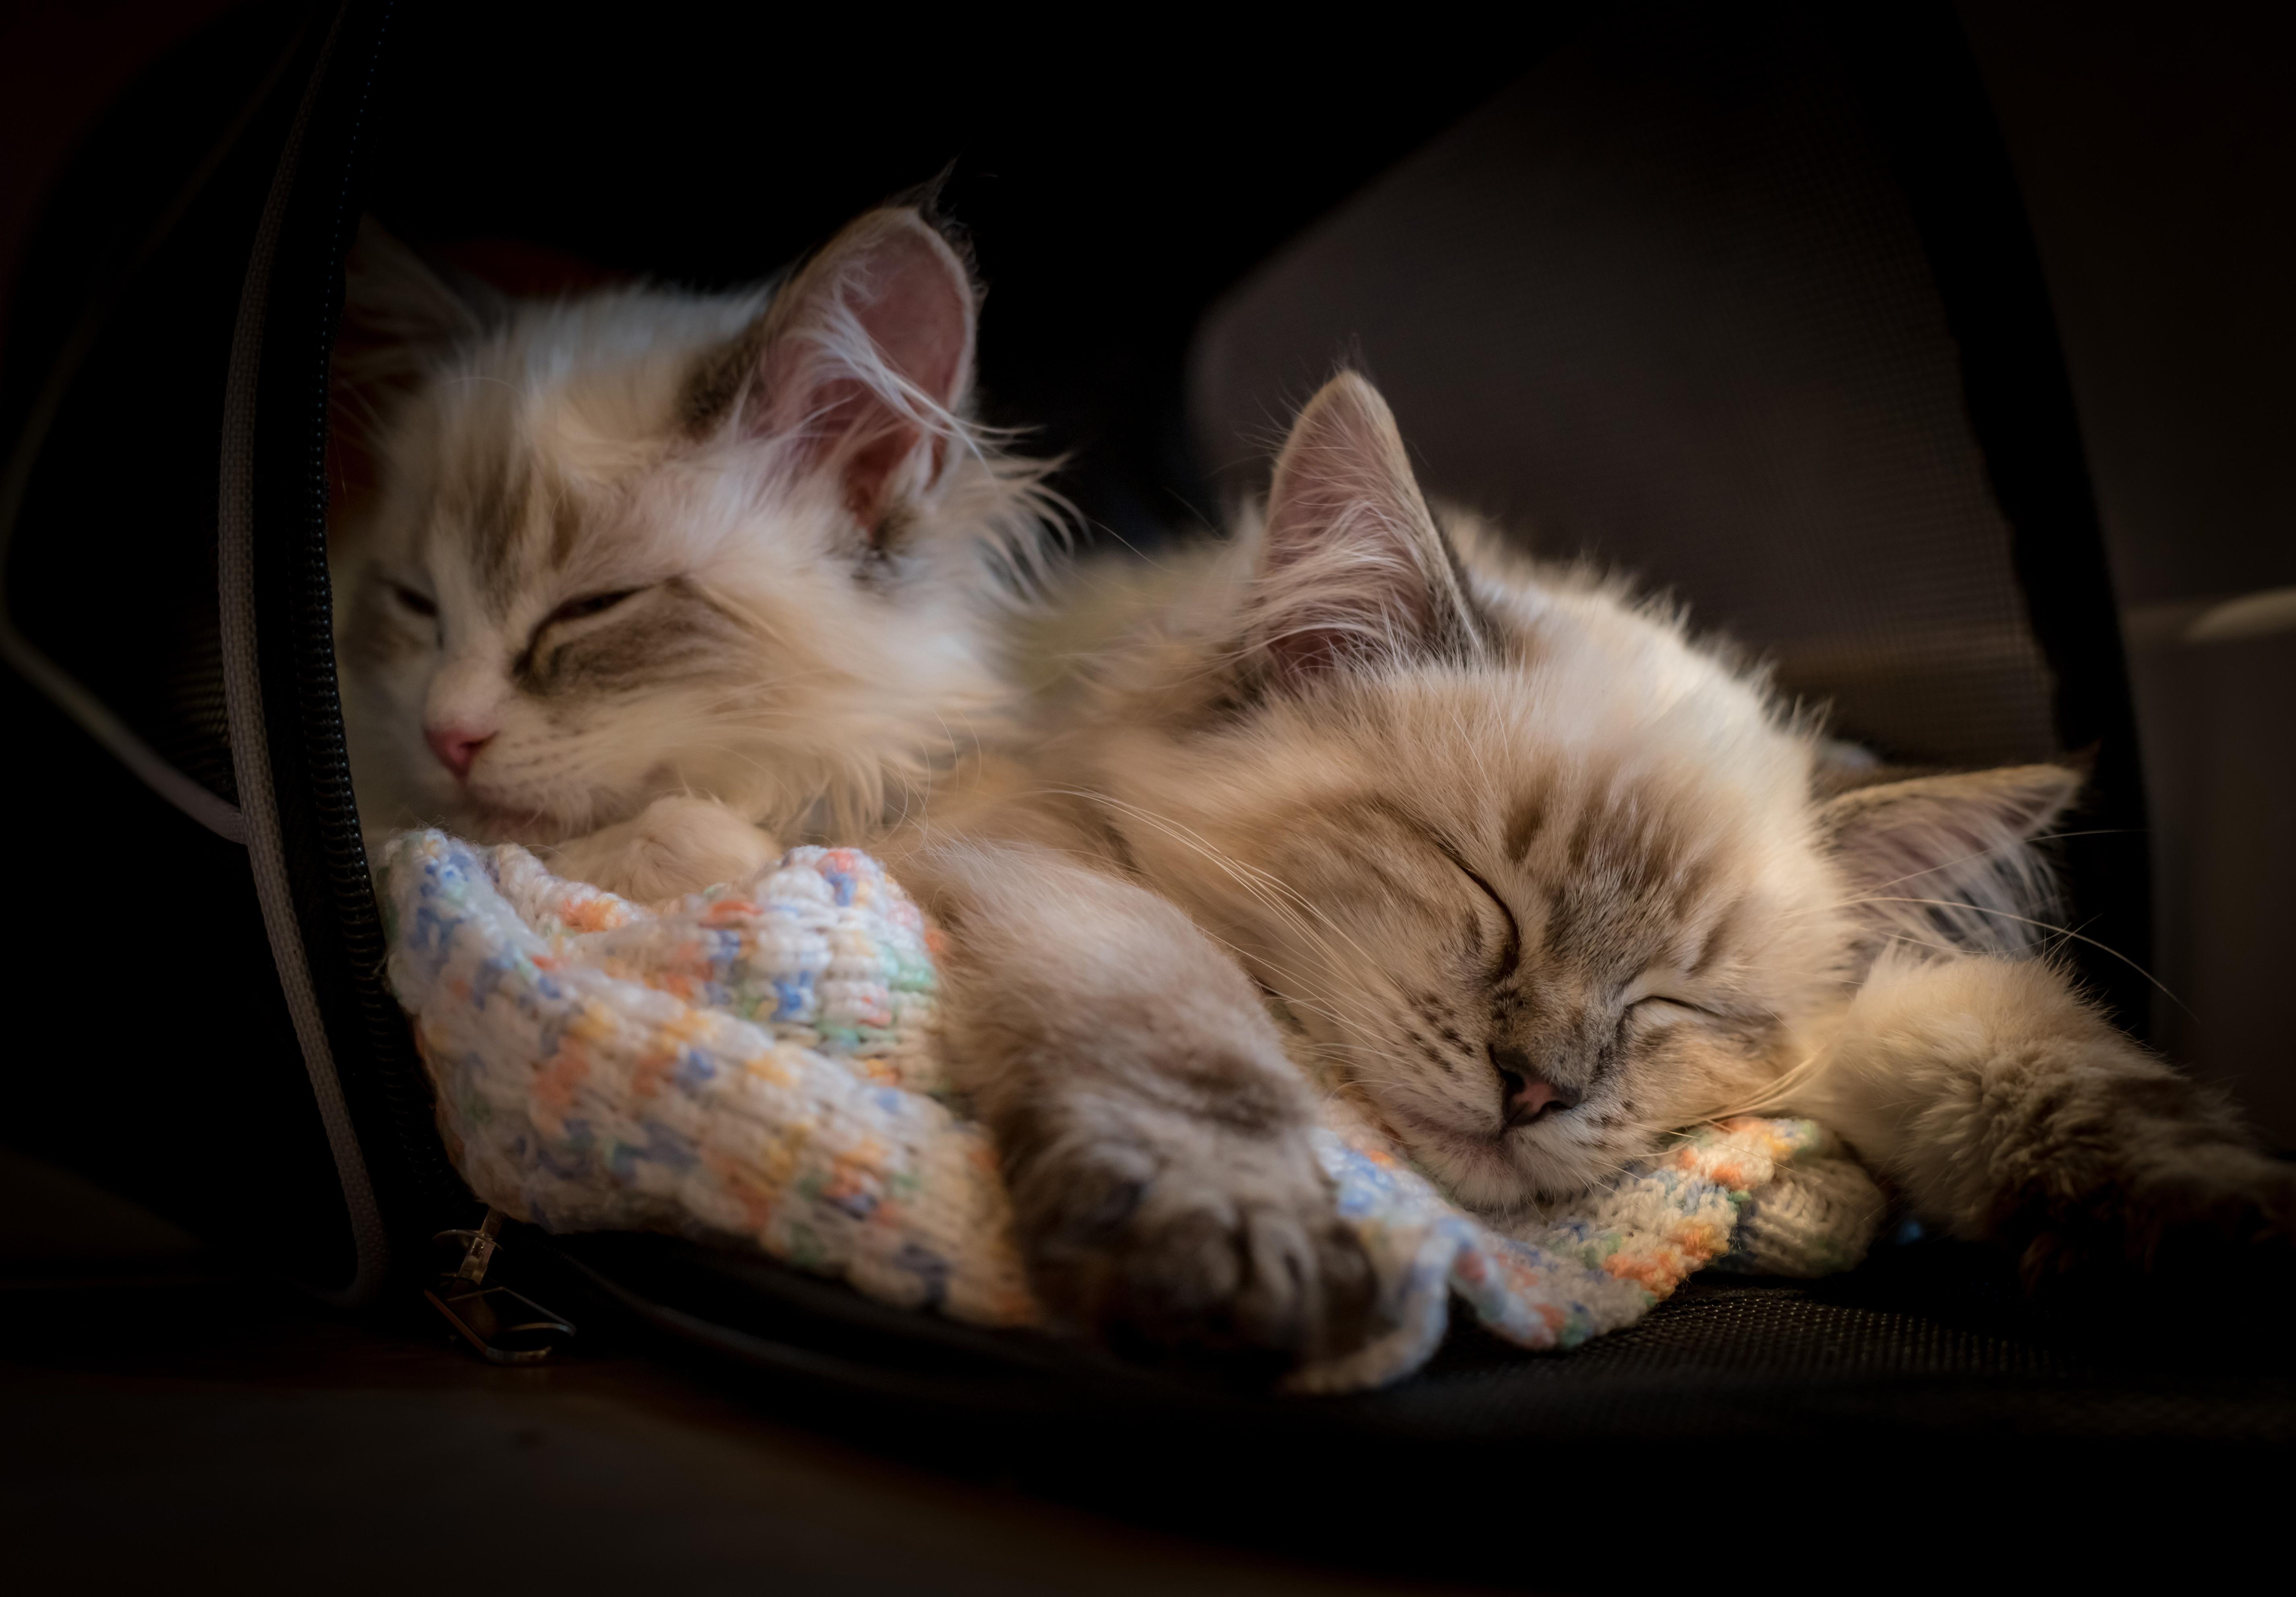 General 5700x3965 cats kittens animals mammals sleeping